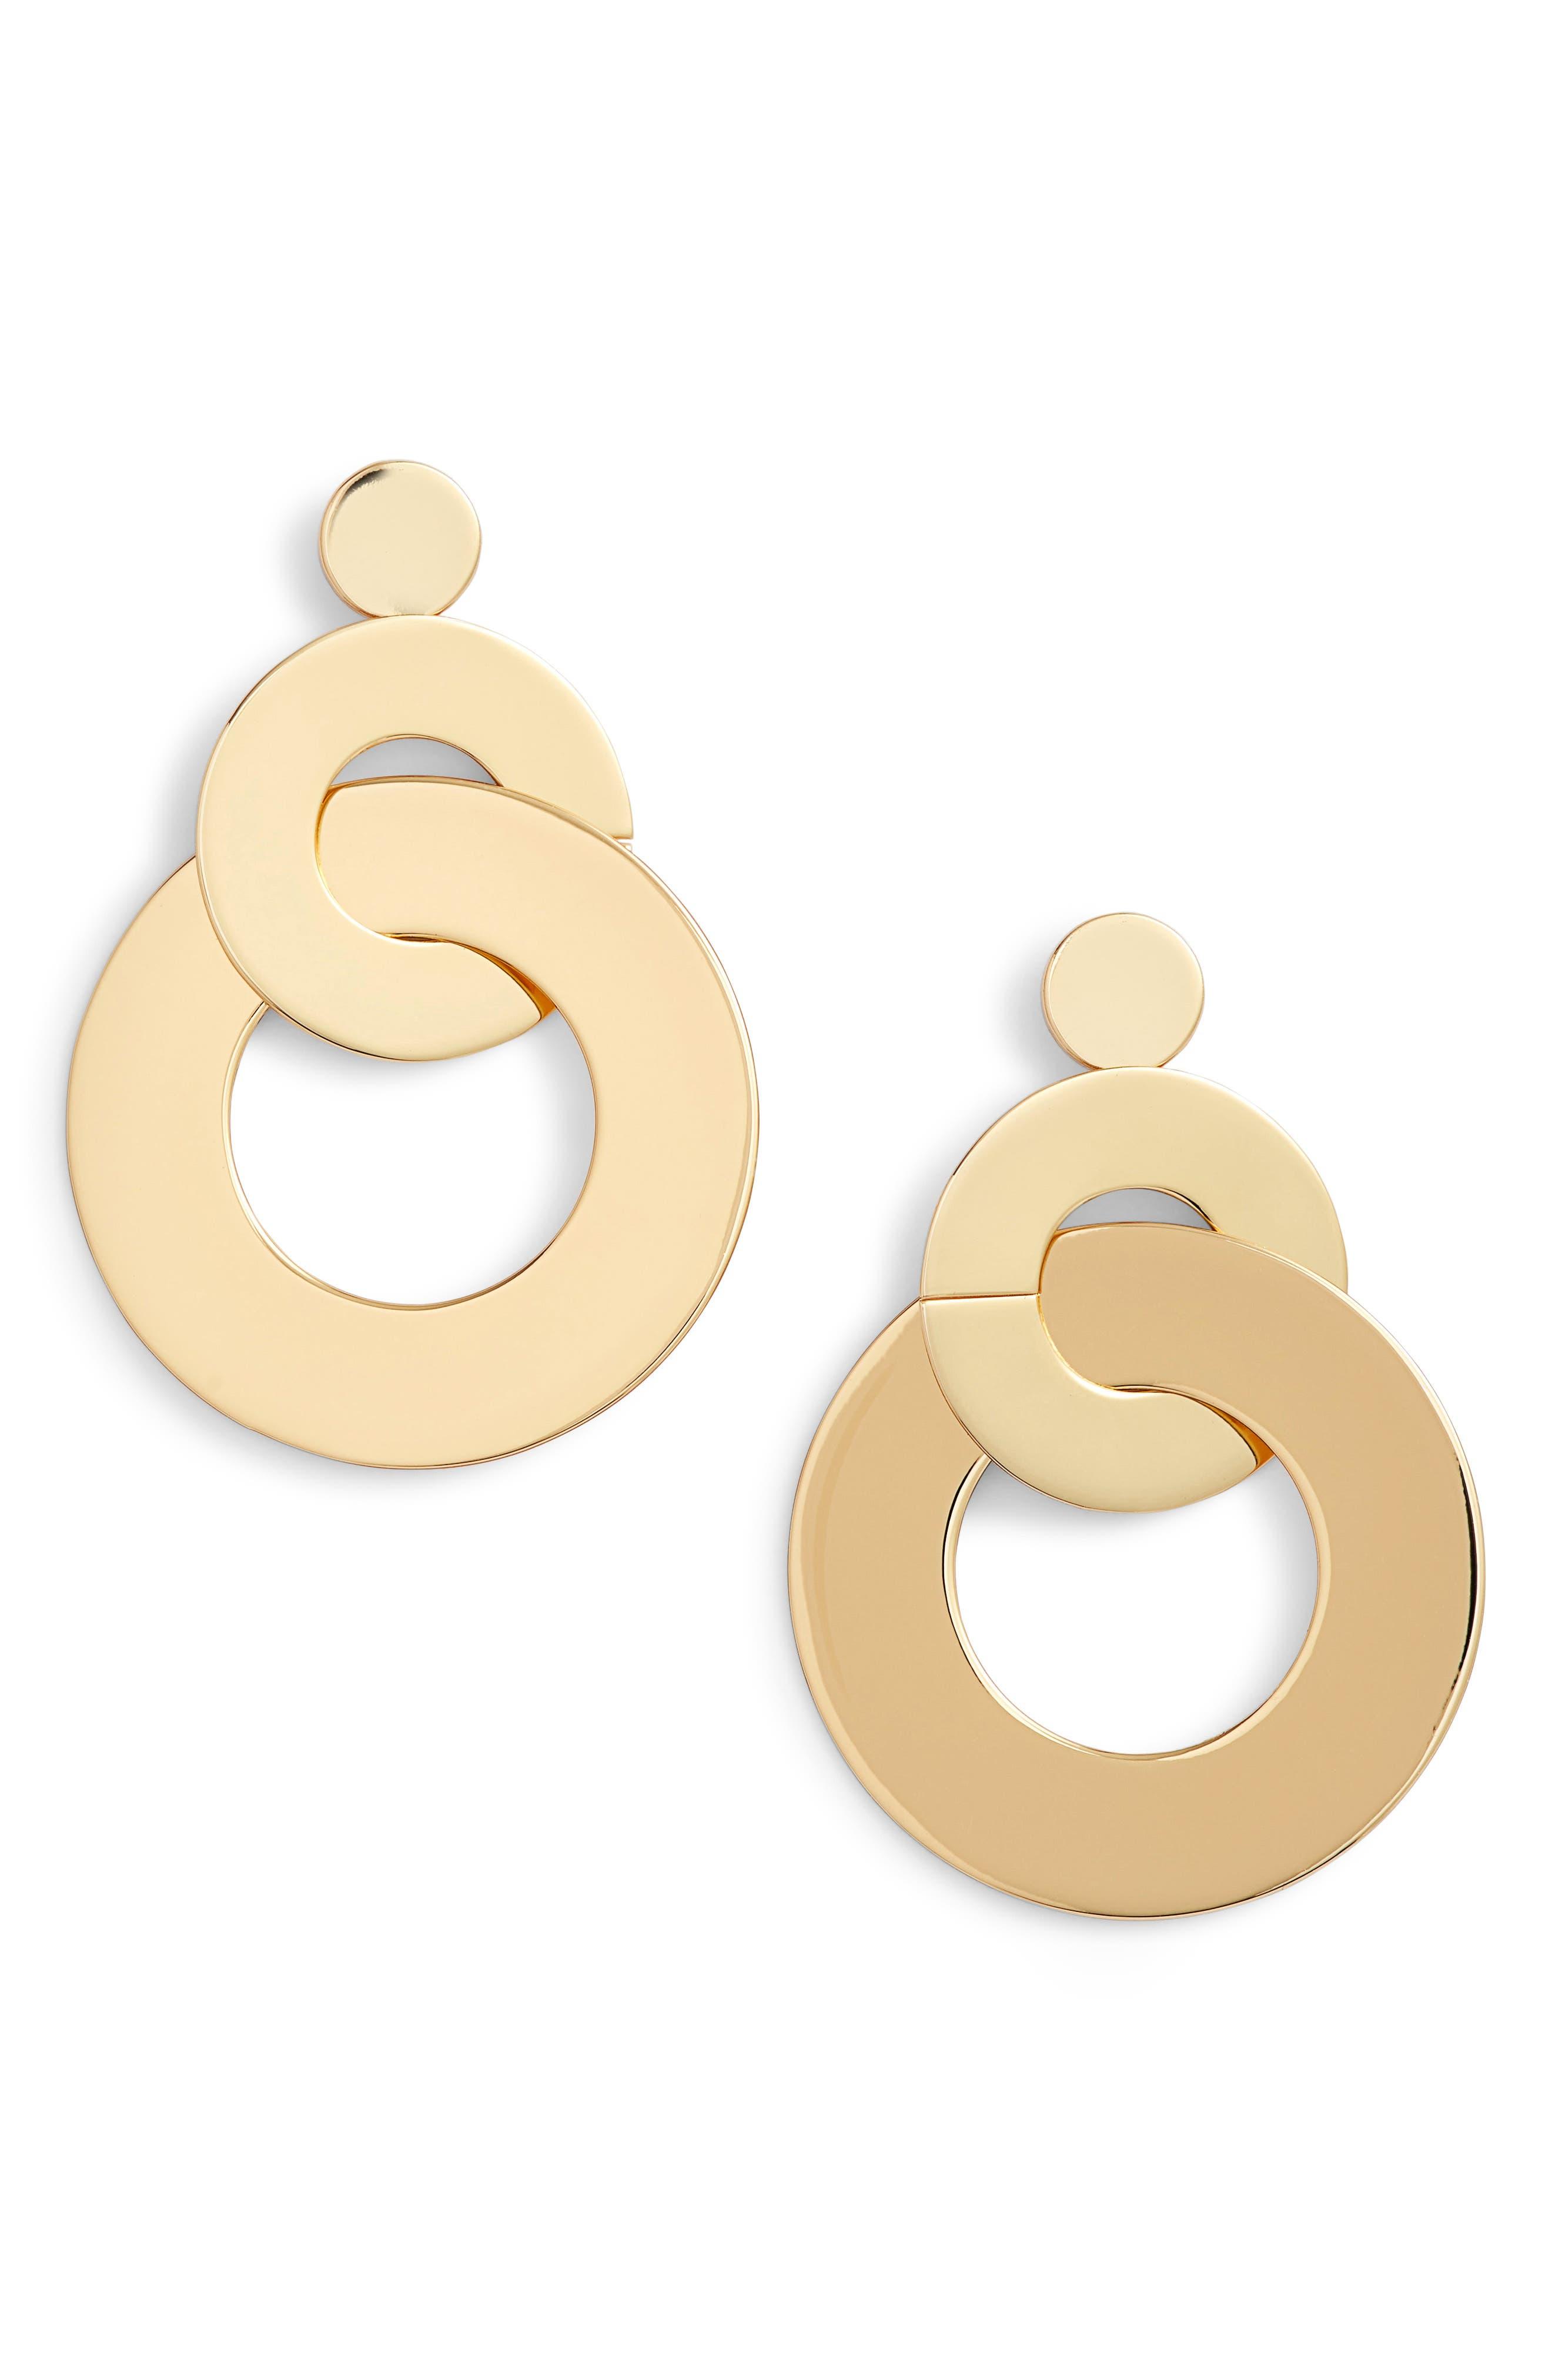 TGIF Earrings,                         Main,                         color, GOLD